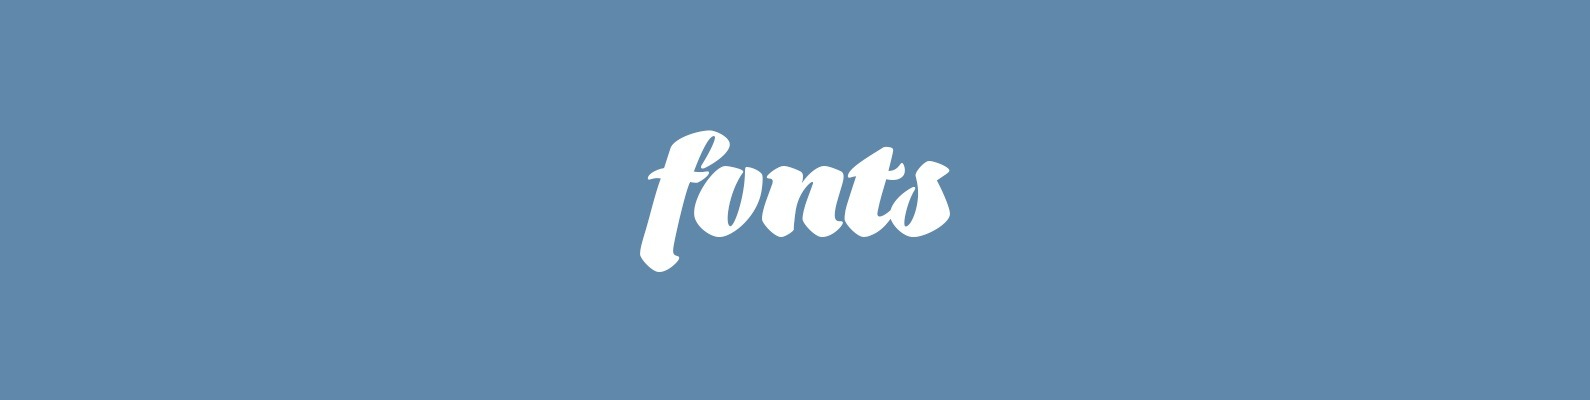 Fonts шрифты вконтакте